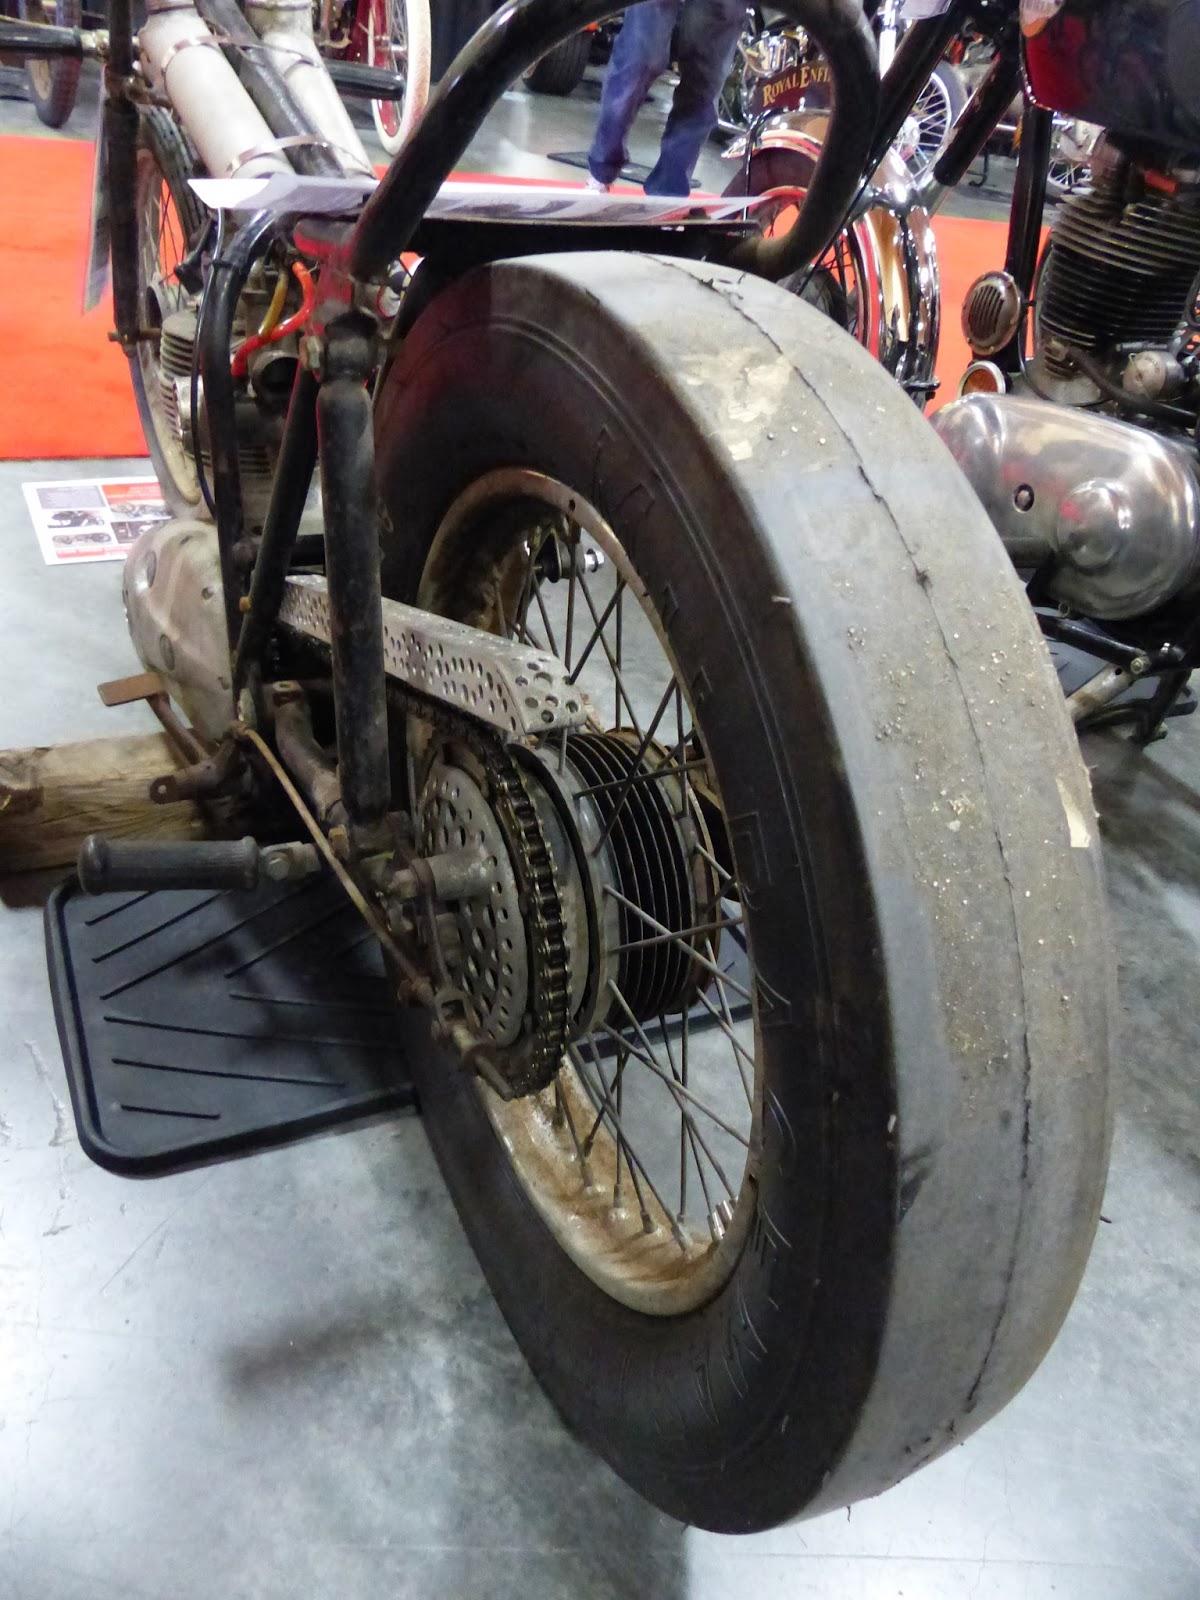 Oldmotodude 1966 Bsa 441 Victor Drag Bike For Sale At The